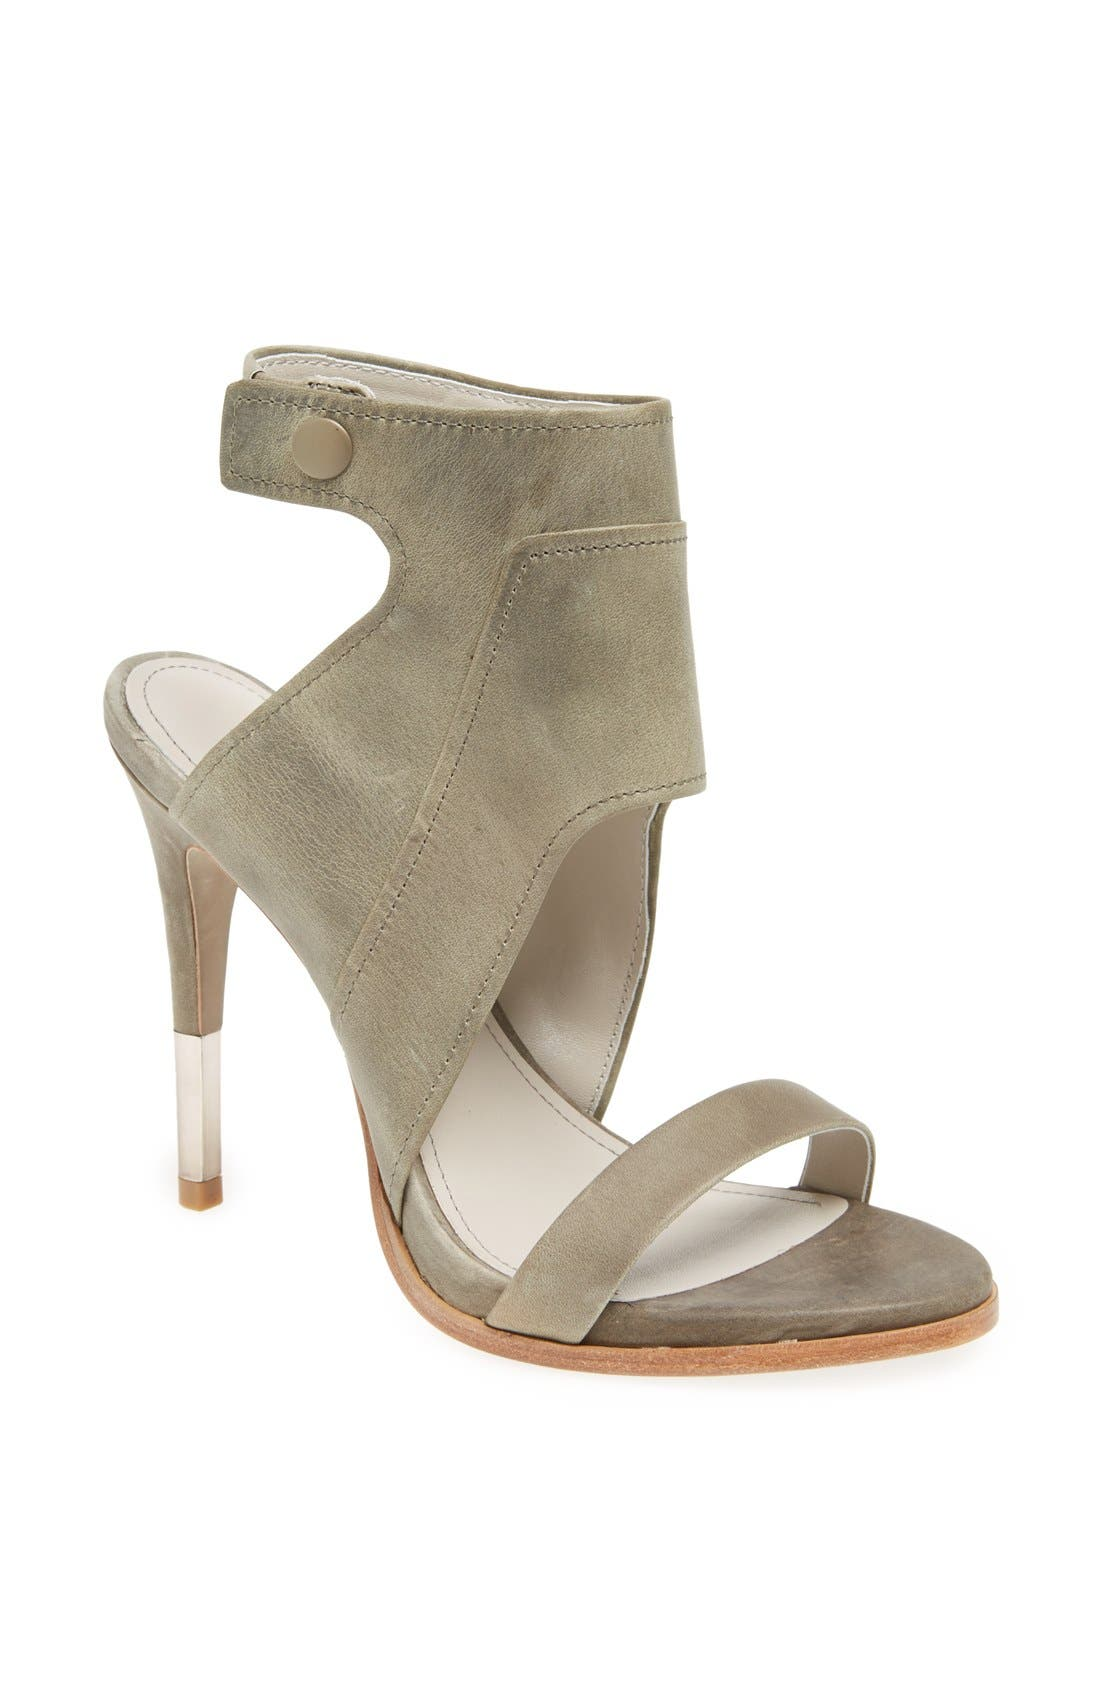 Alternate Image 1 Selected - Pour la Victoire 'Venga' Sandal